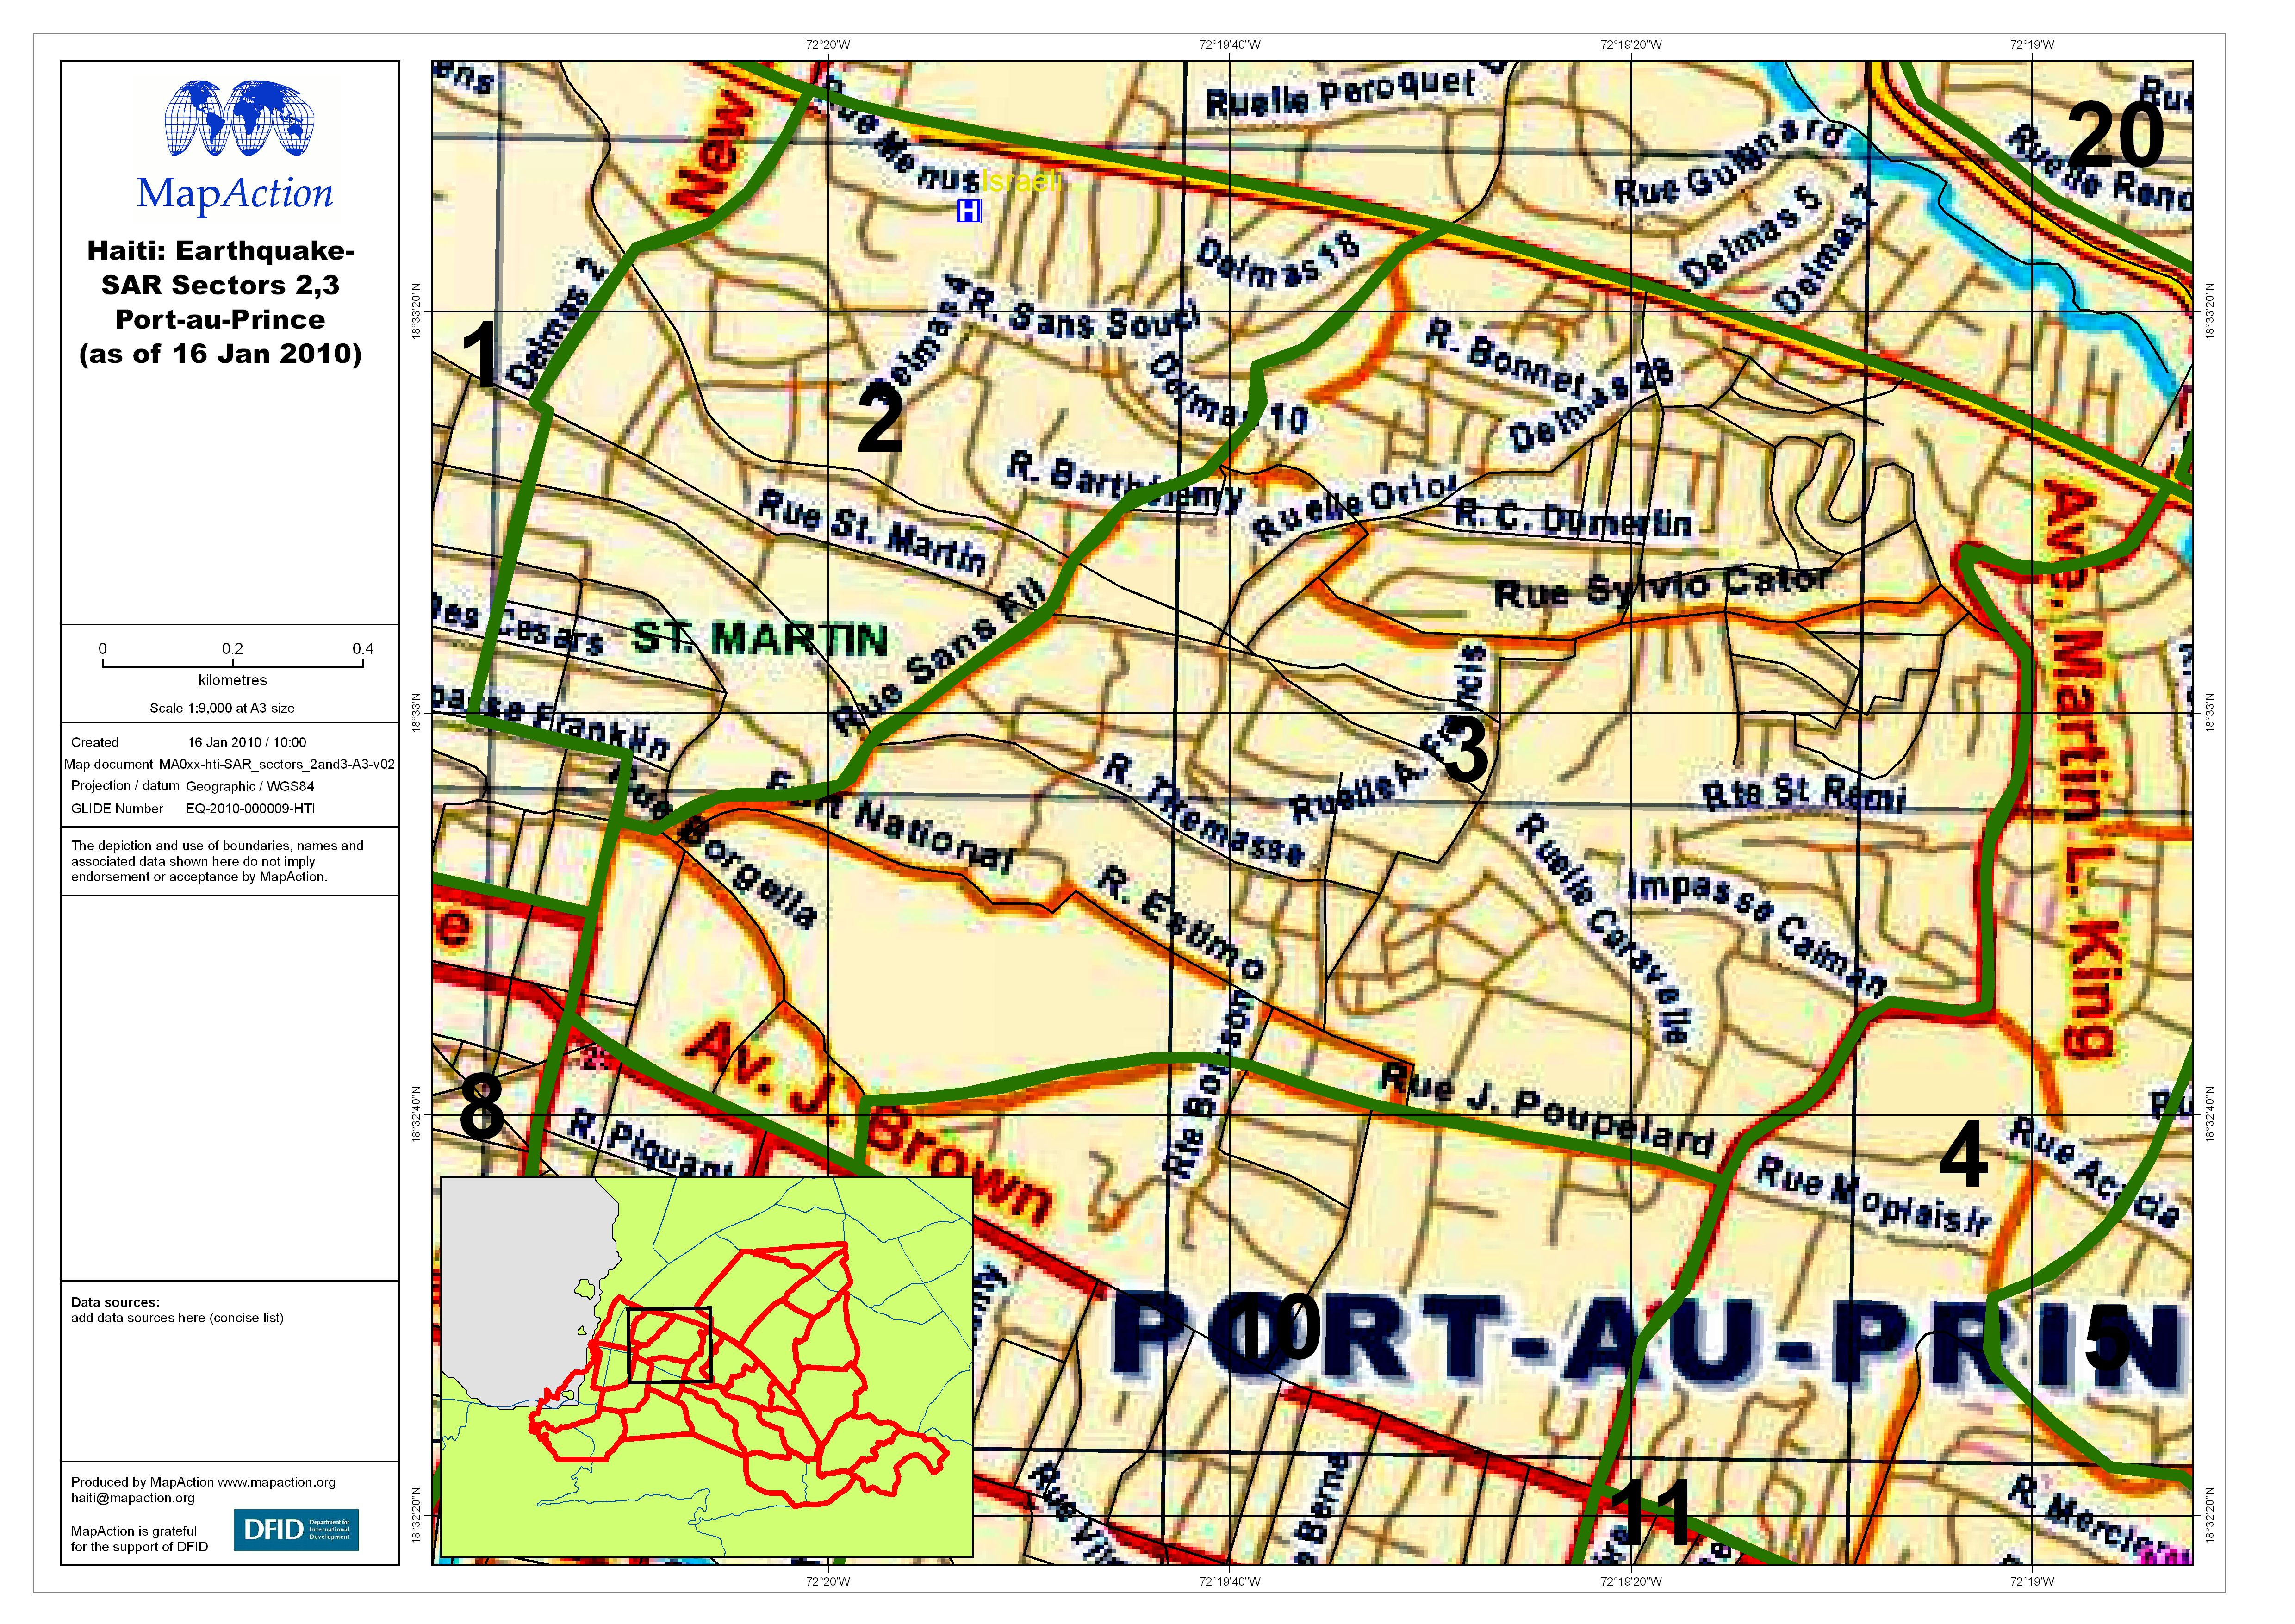 Haiti Earthquake Sar Sector 2 And 3 Port Au Prince Datasets